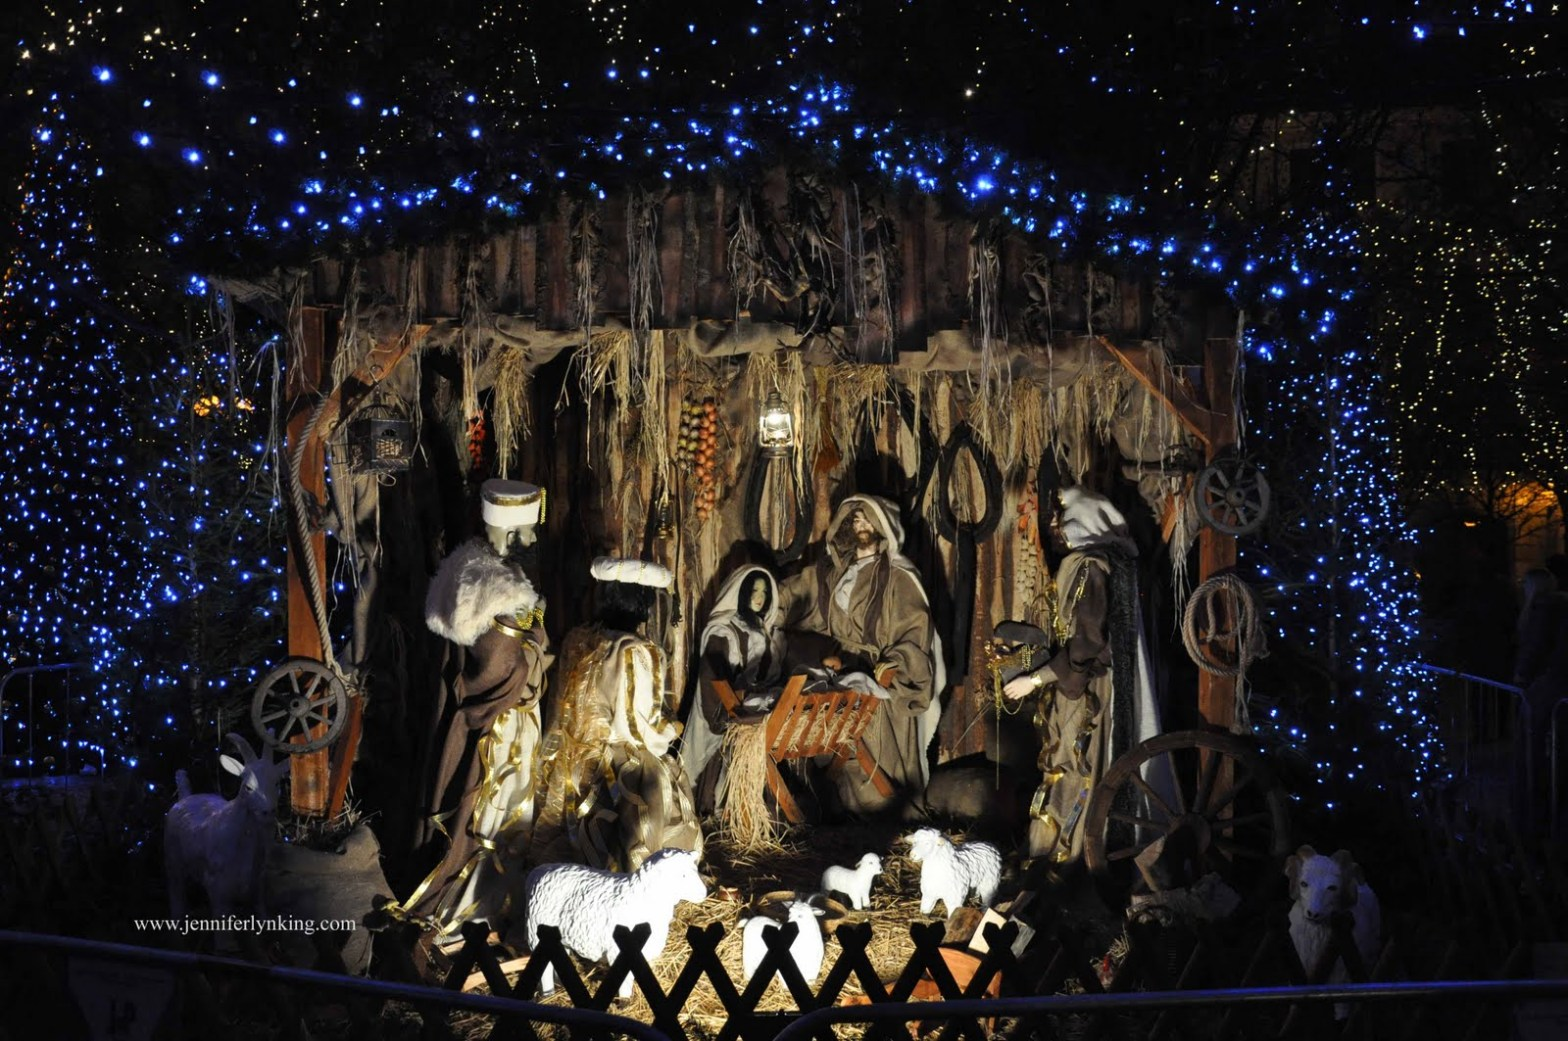 The Nativity near Saint Nikolas Church, on Old Town Square, Prague, Czech Republic